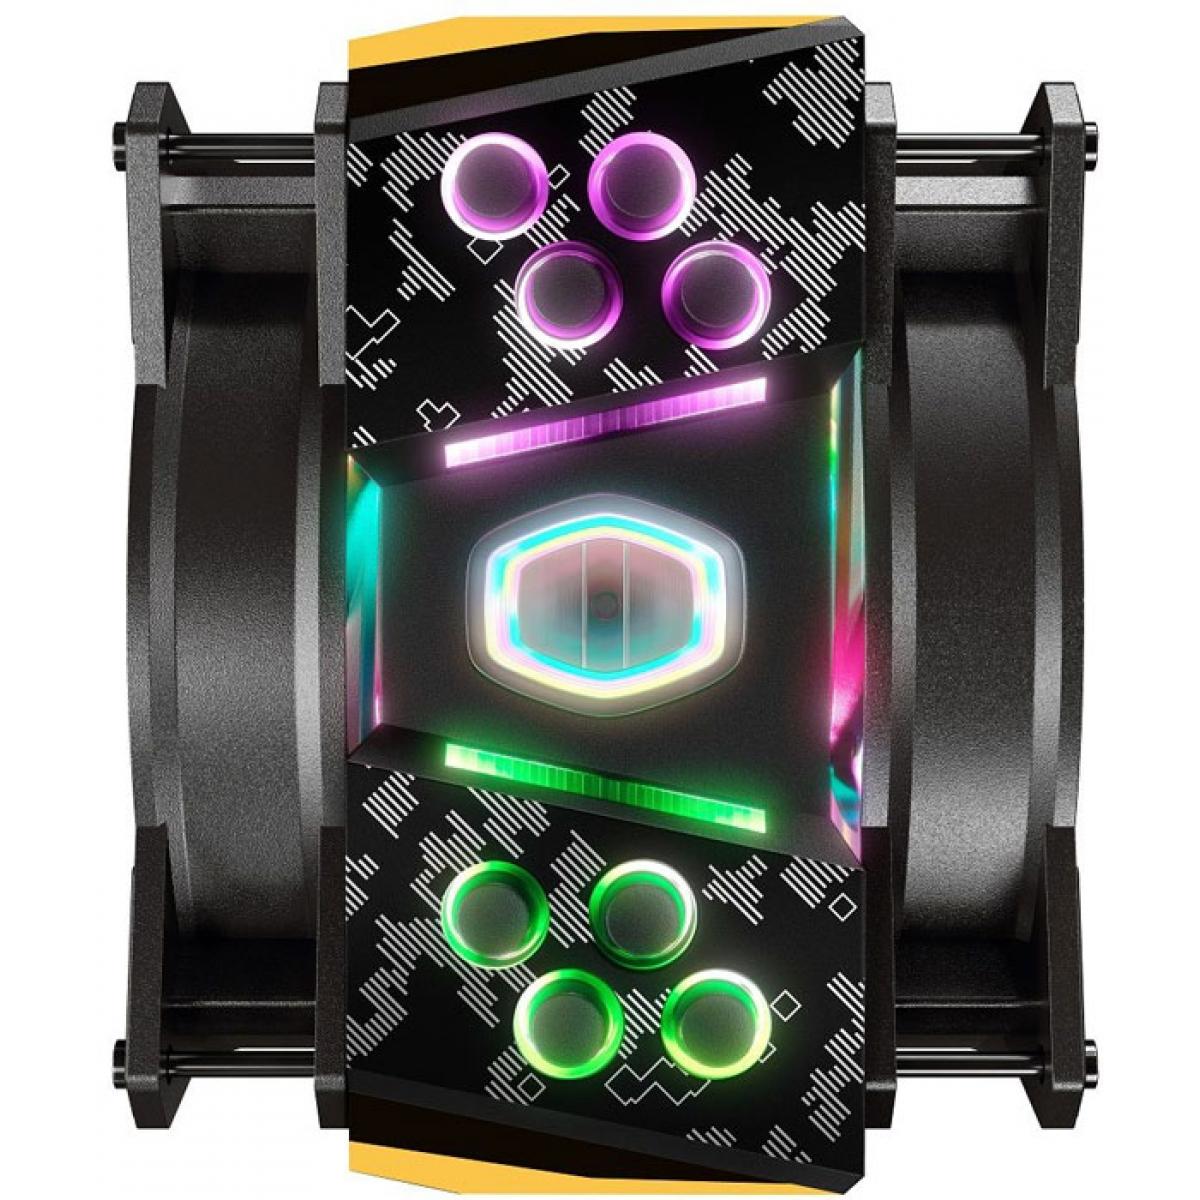 Cooler para Processador Cooler Master Masterair MA410M TUF, RGB, Intel/AMD, MAM-T4PN-AFNPC-R1